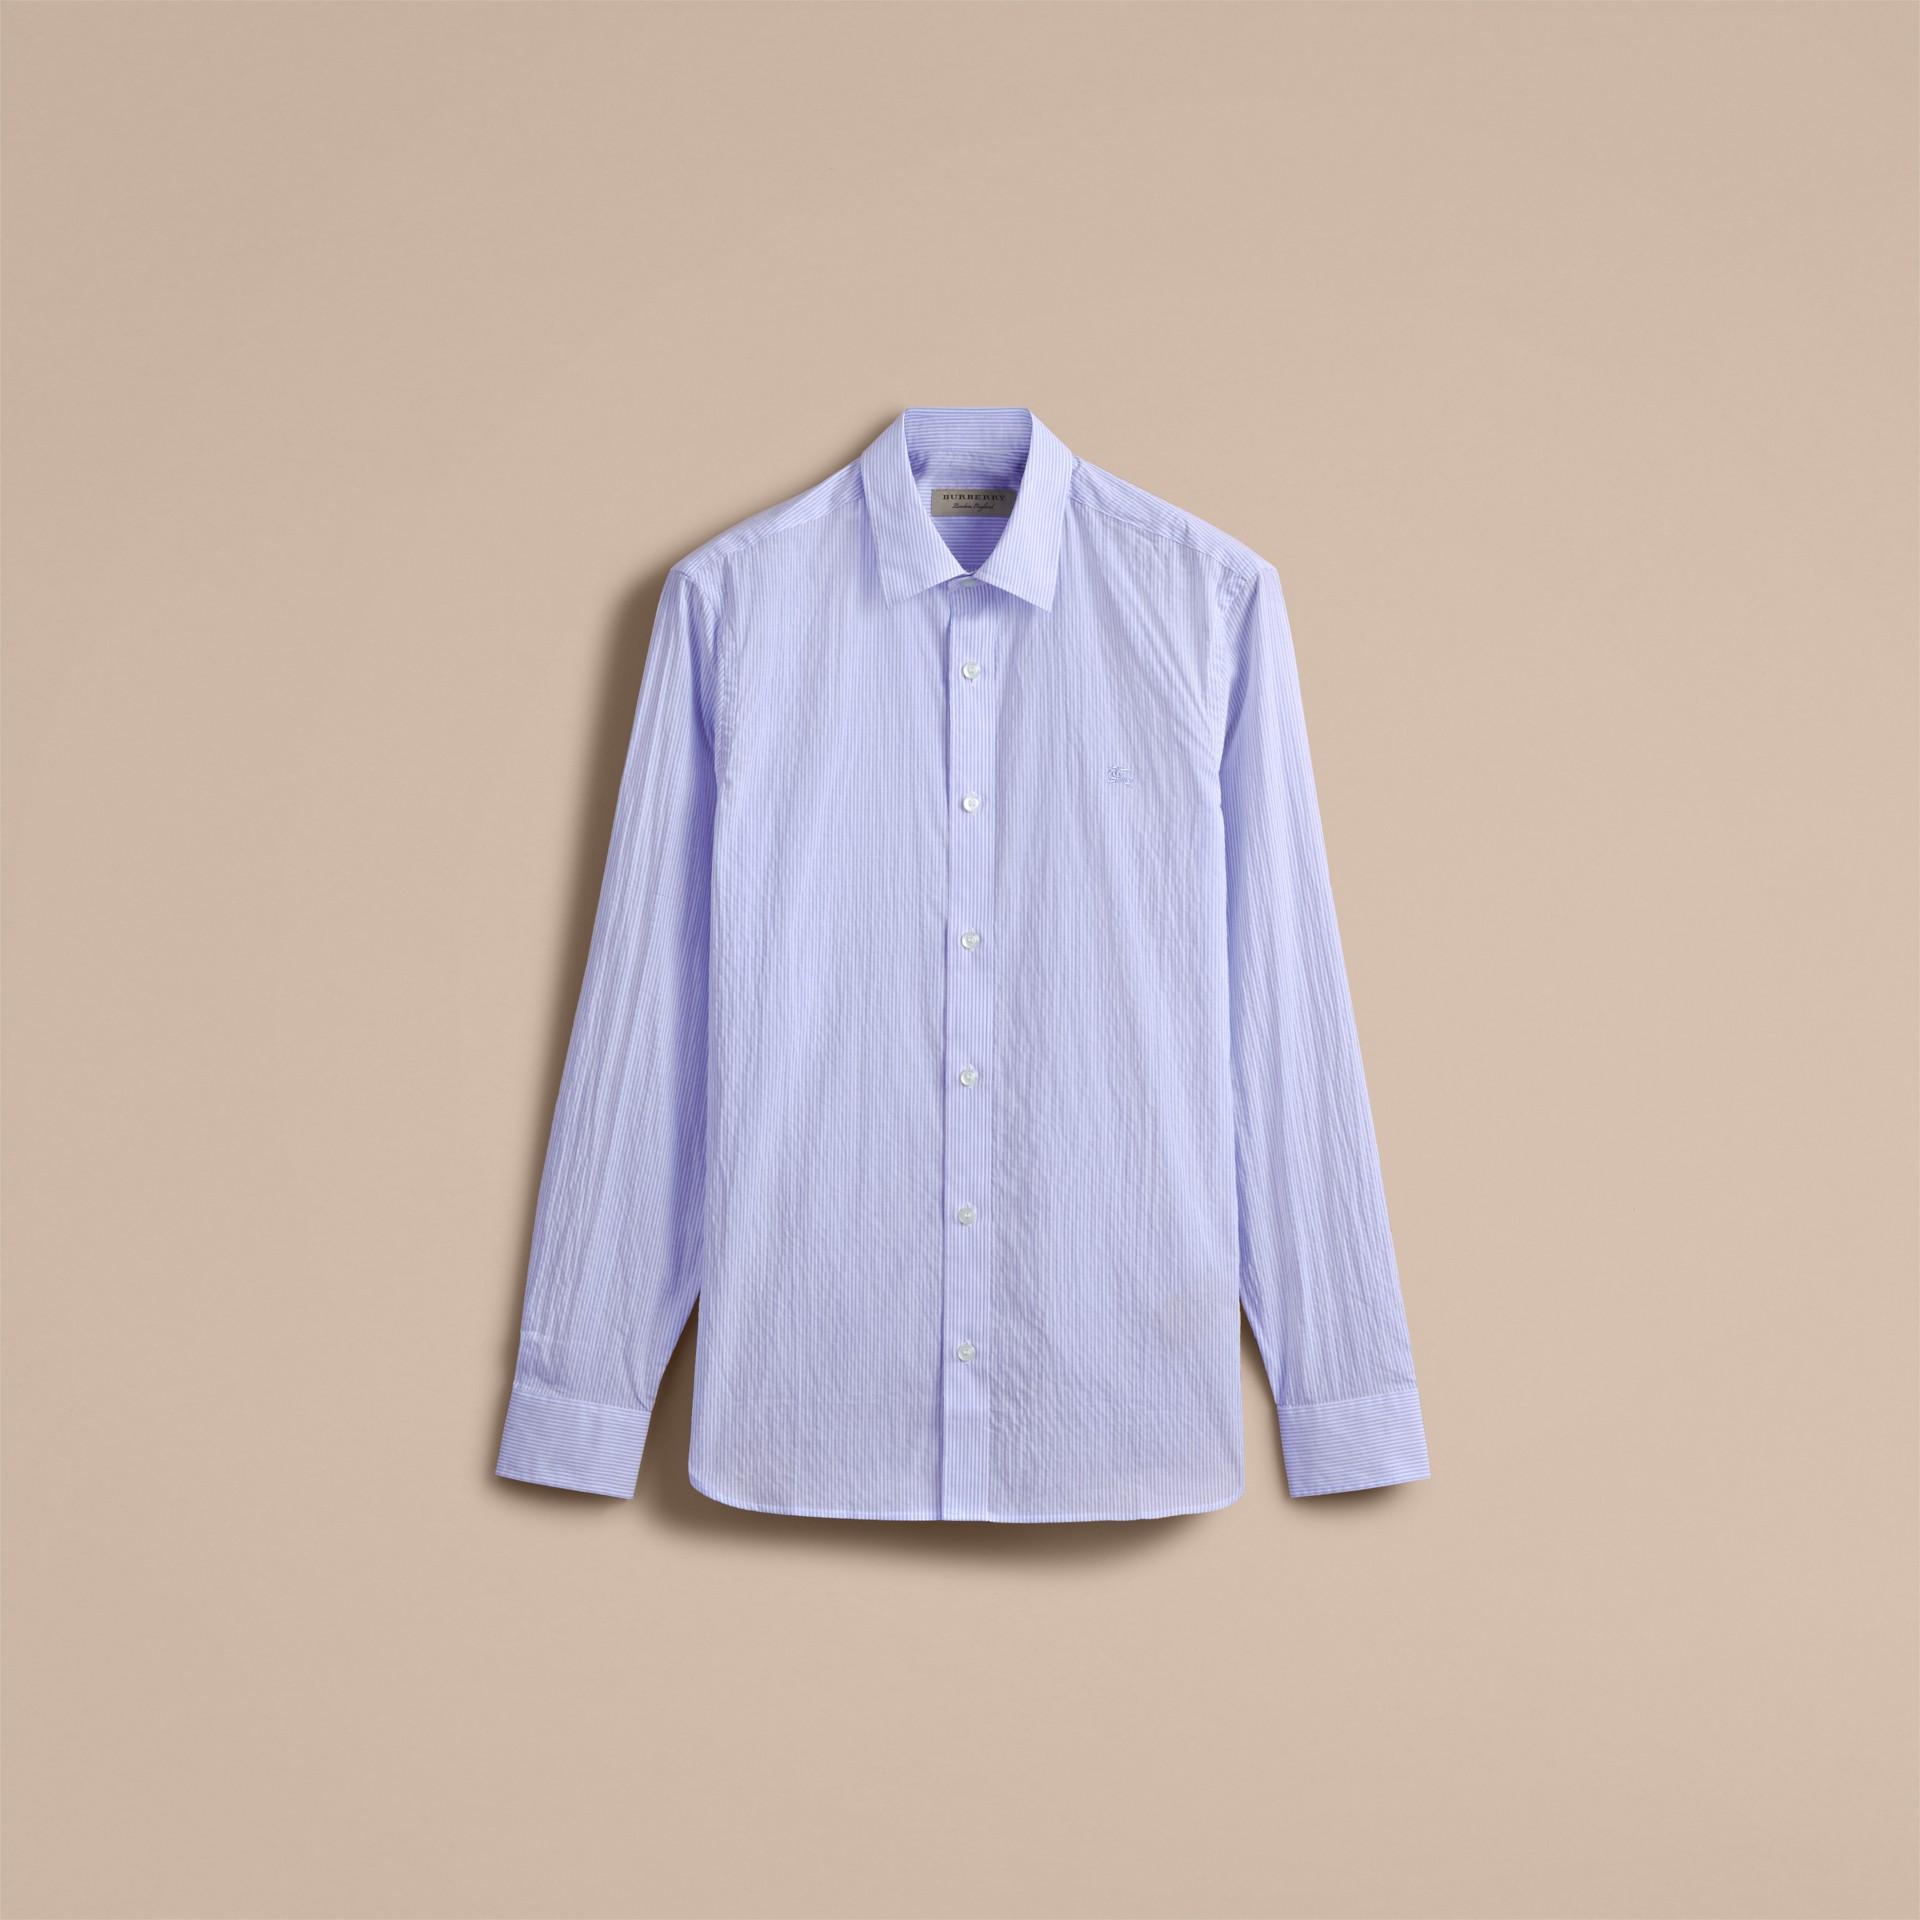 Striped Cotton Blend Shirt Light Blue - gallery image 4